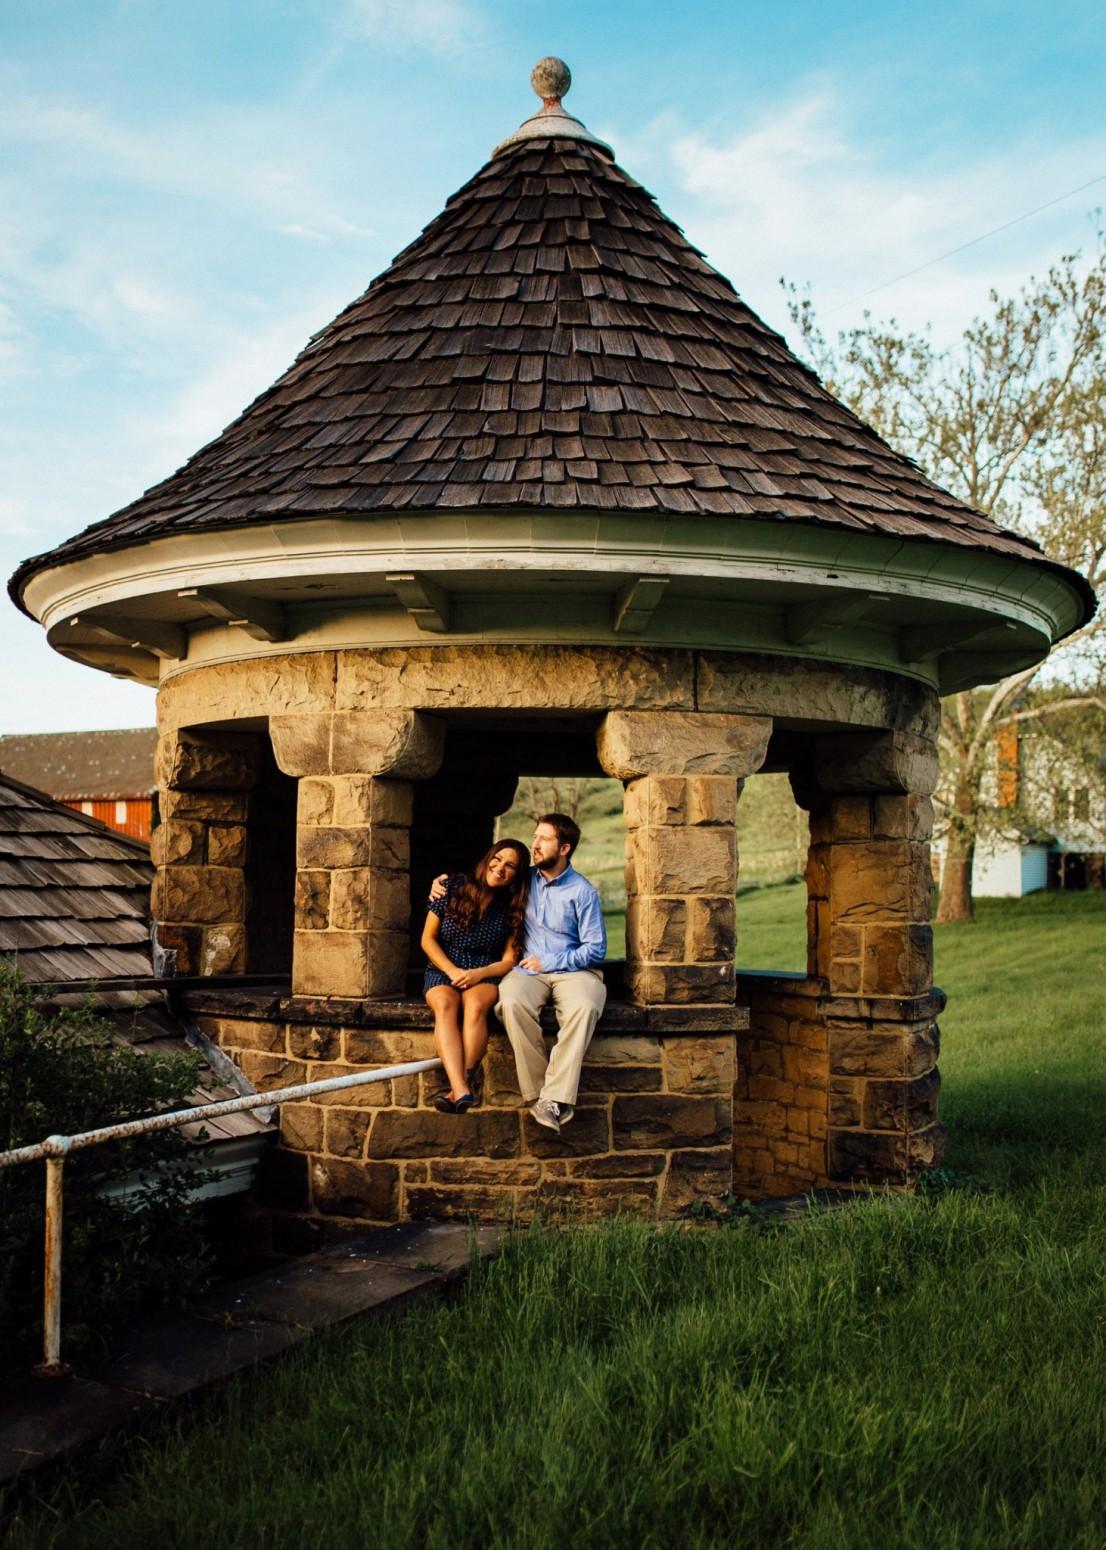 wild-native-photography-pittsburgh-pa-engagement-wedding-photographer-brooke-hills-park-danielle-frank_0405